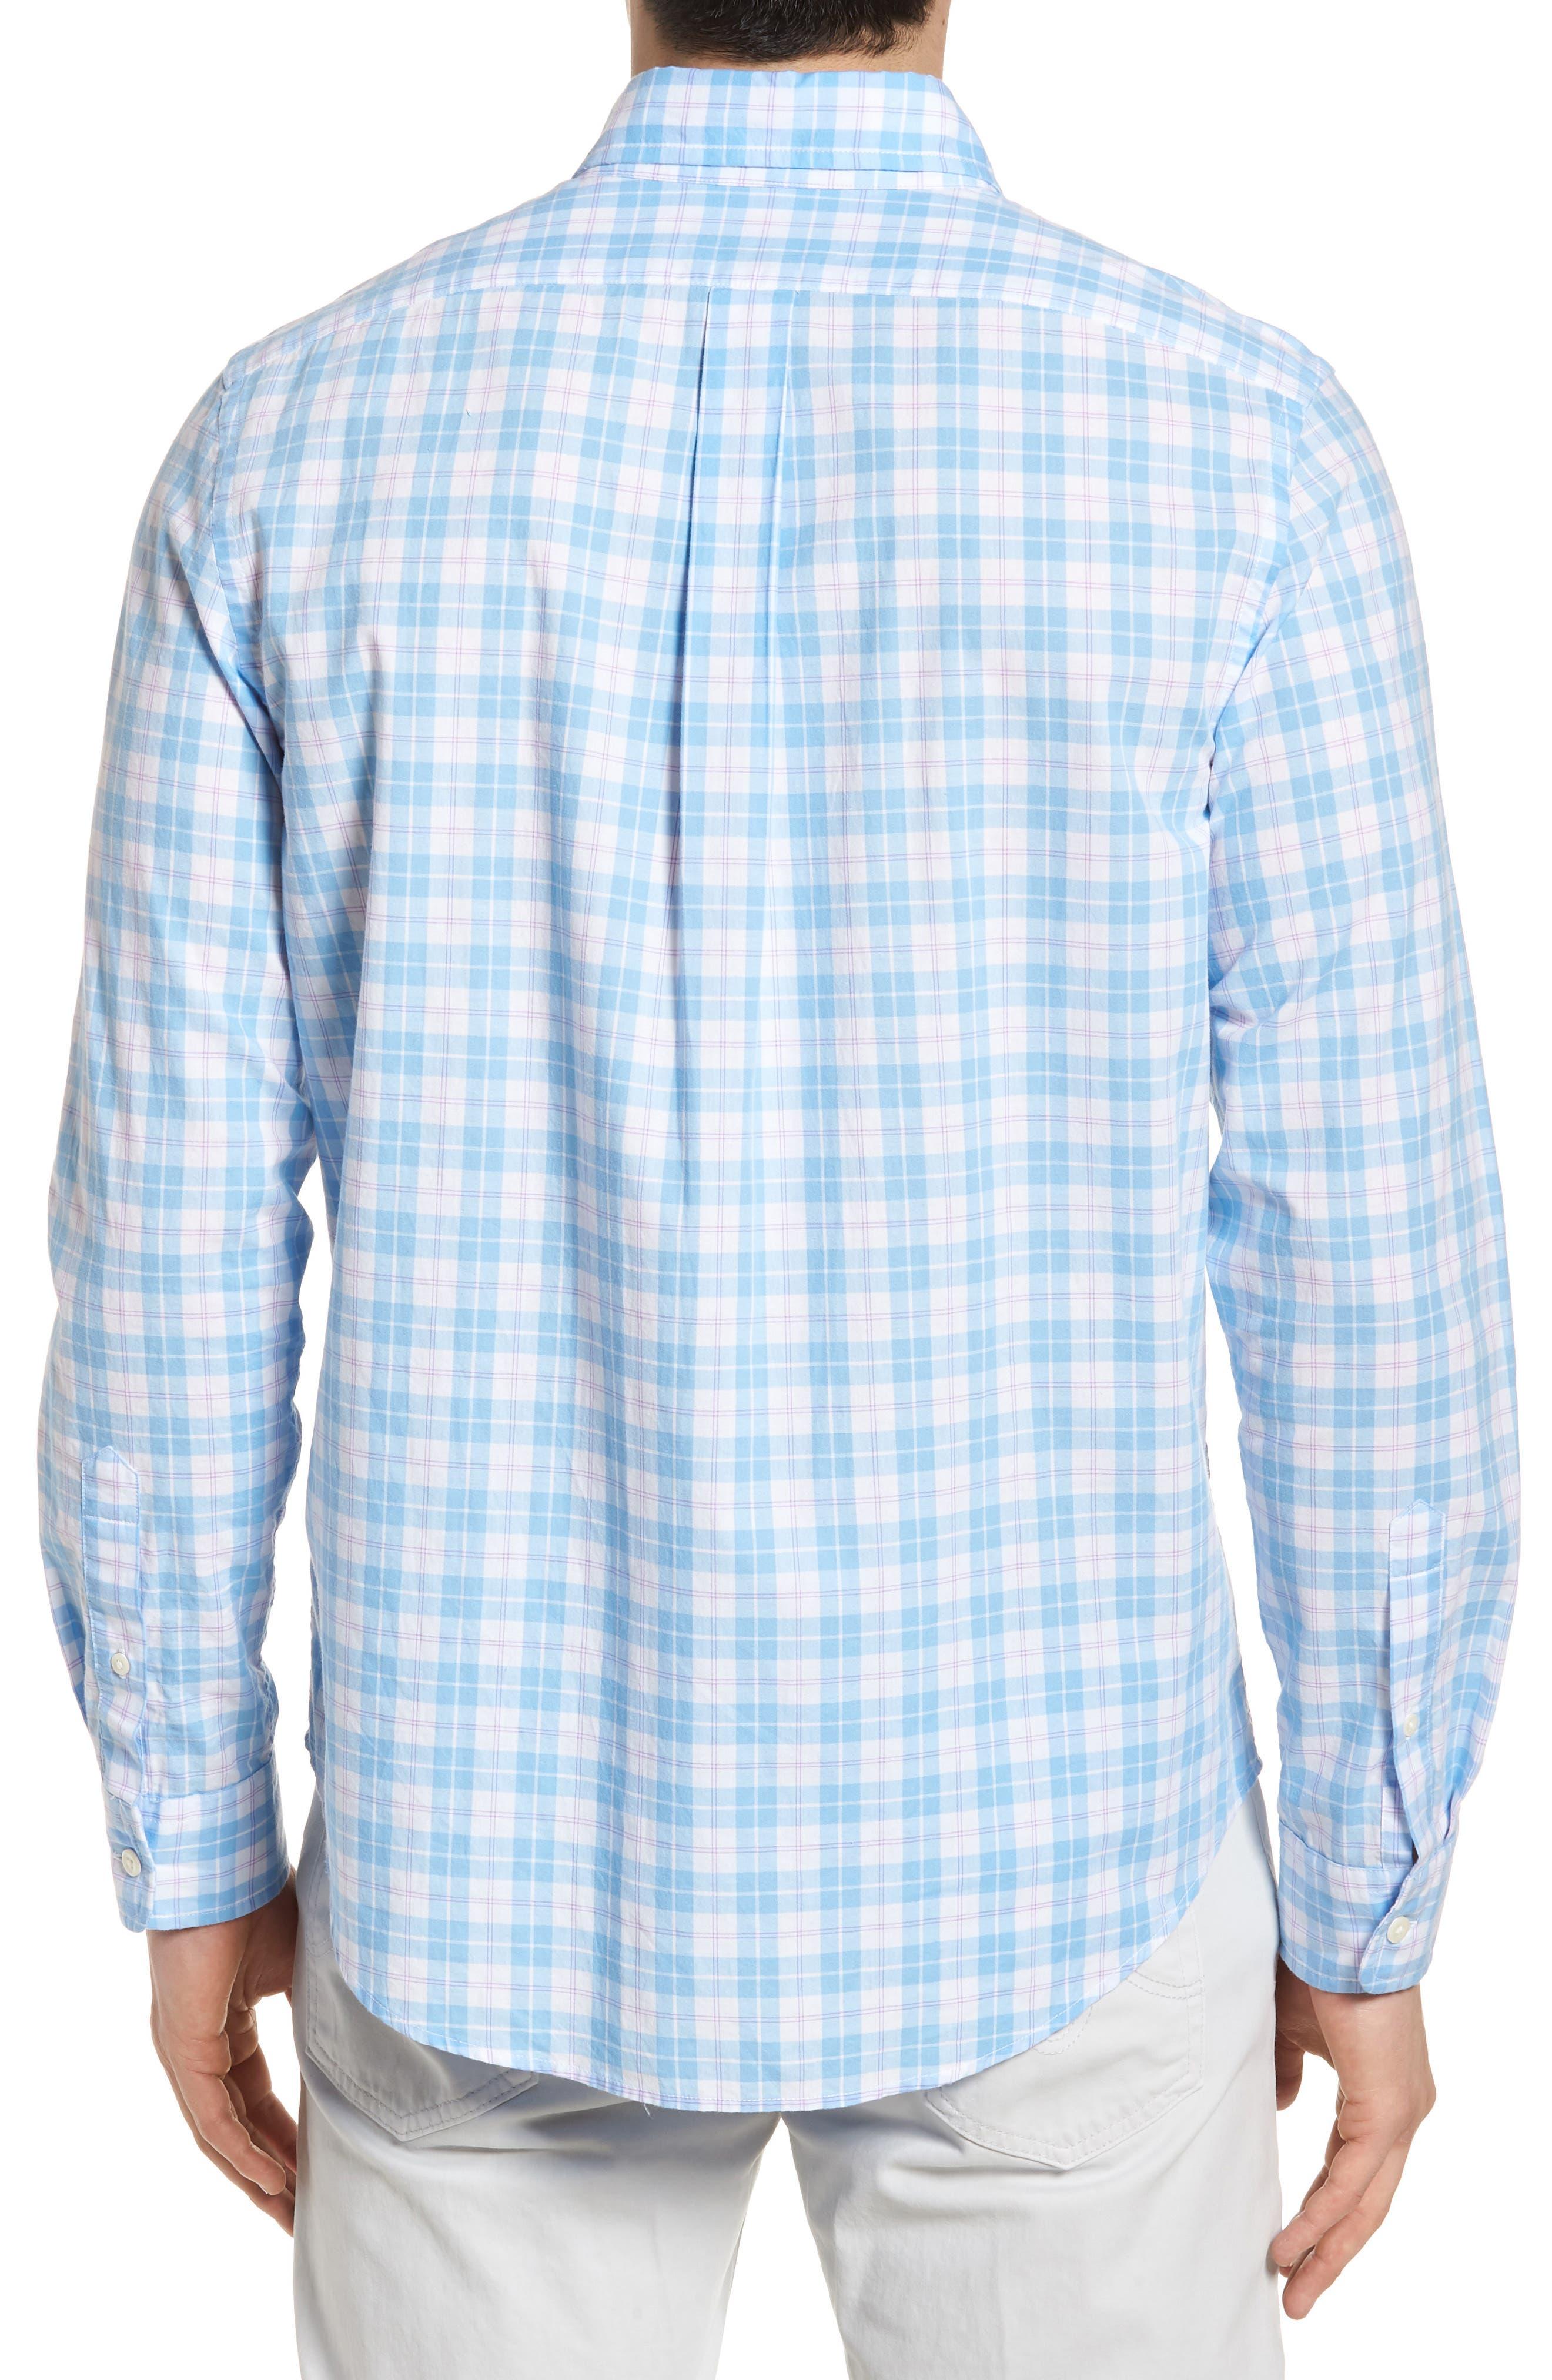 Shallow Sea Slim Fit Plaid Sport Shirt,                             Alternate thumbnail 2, color,                             Ocean Breeze